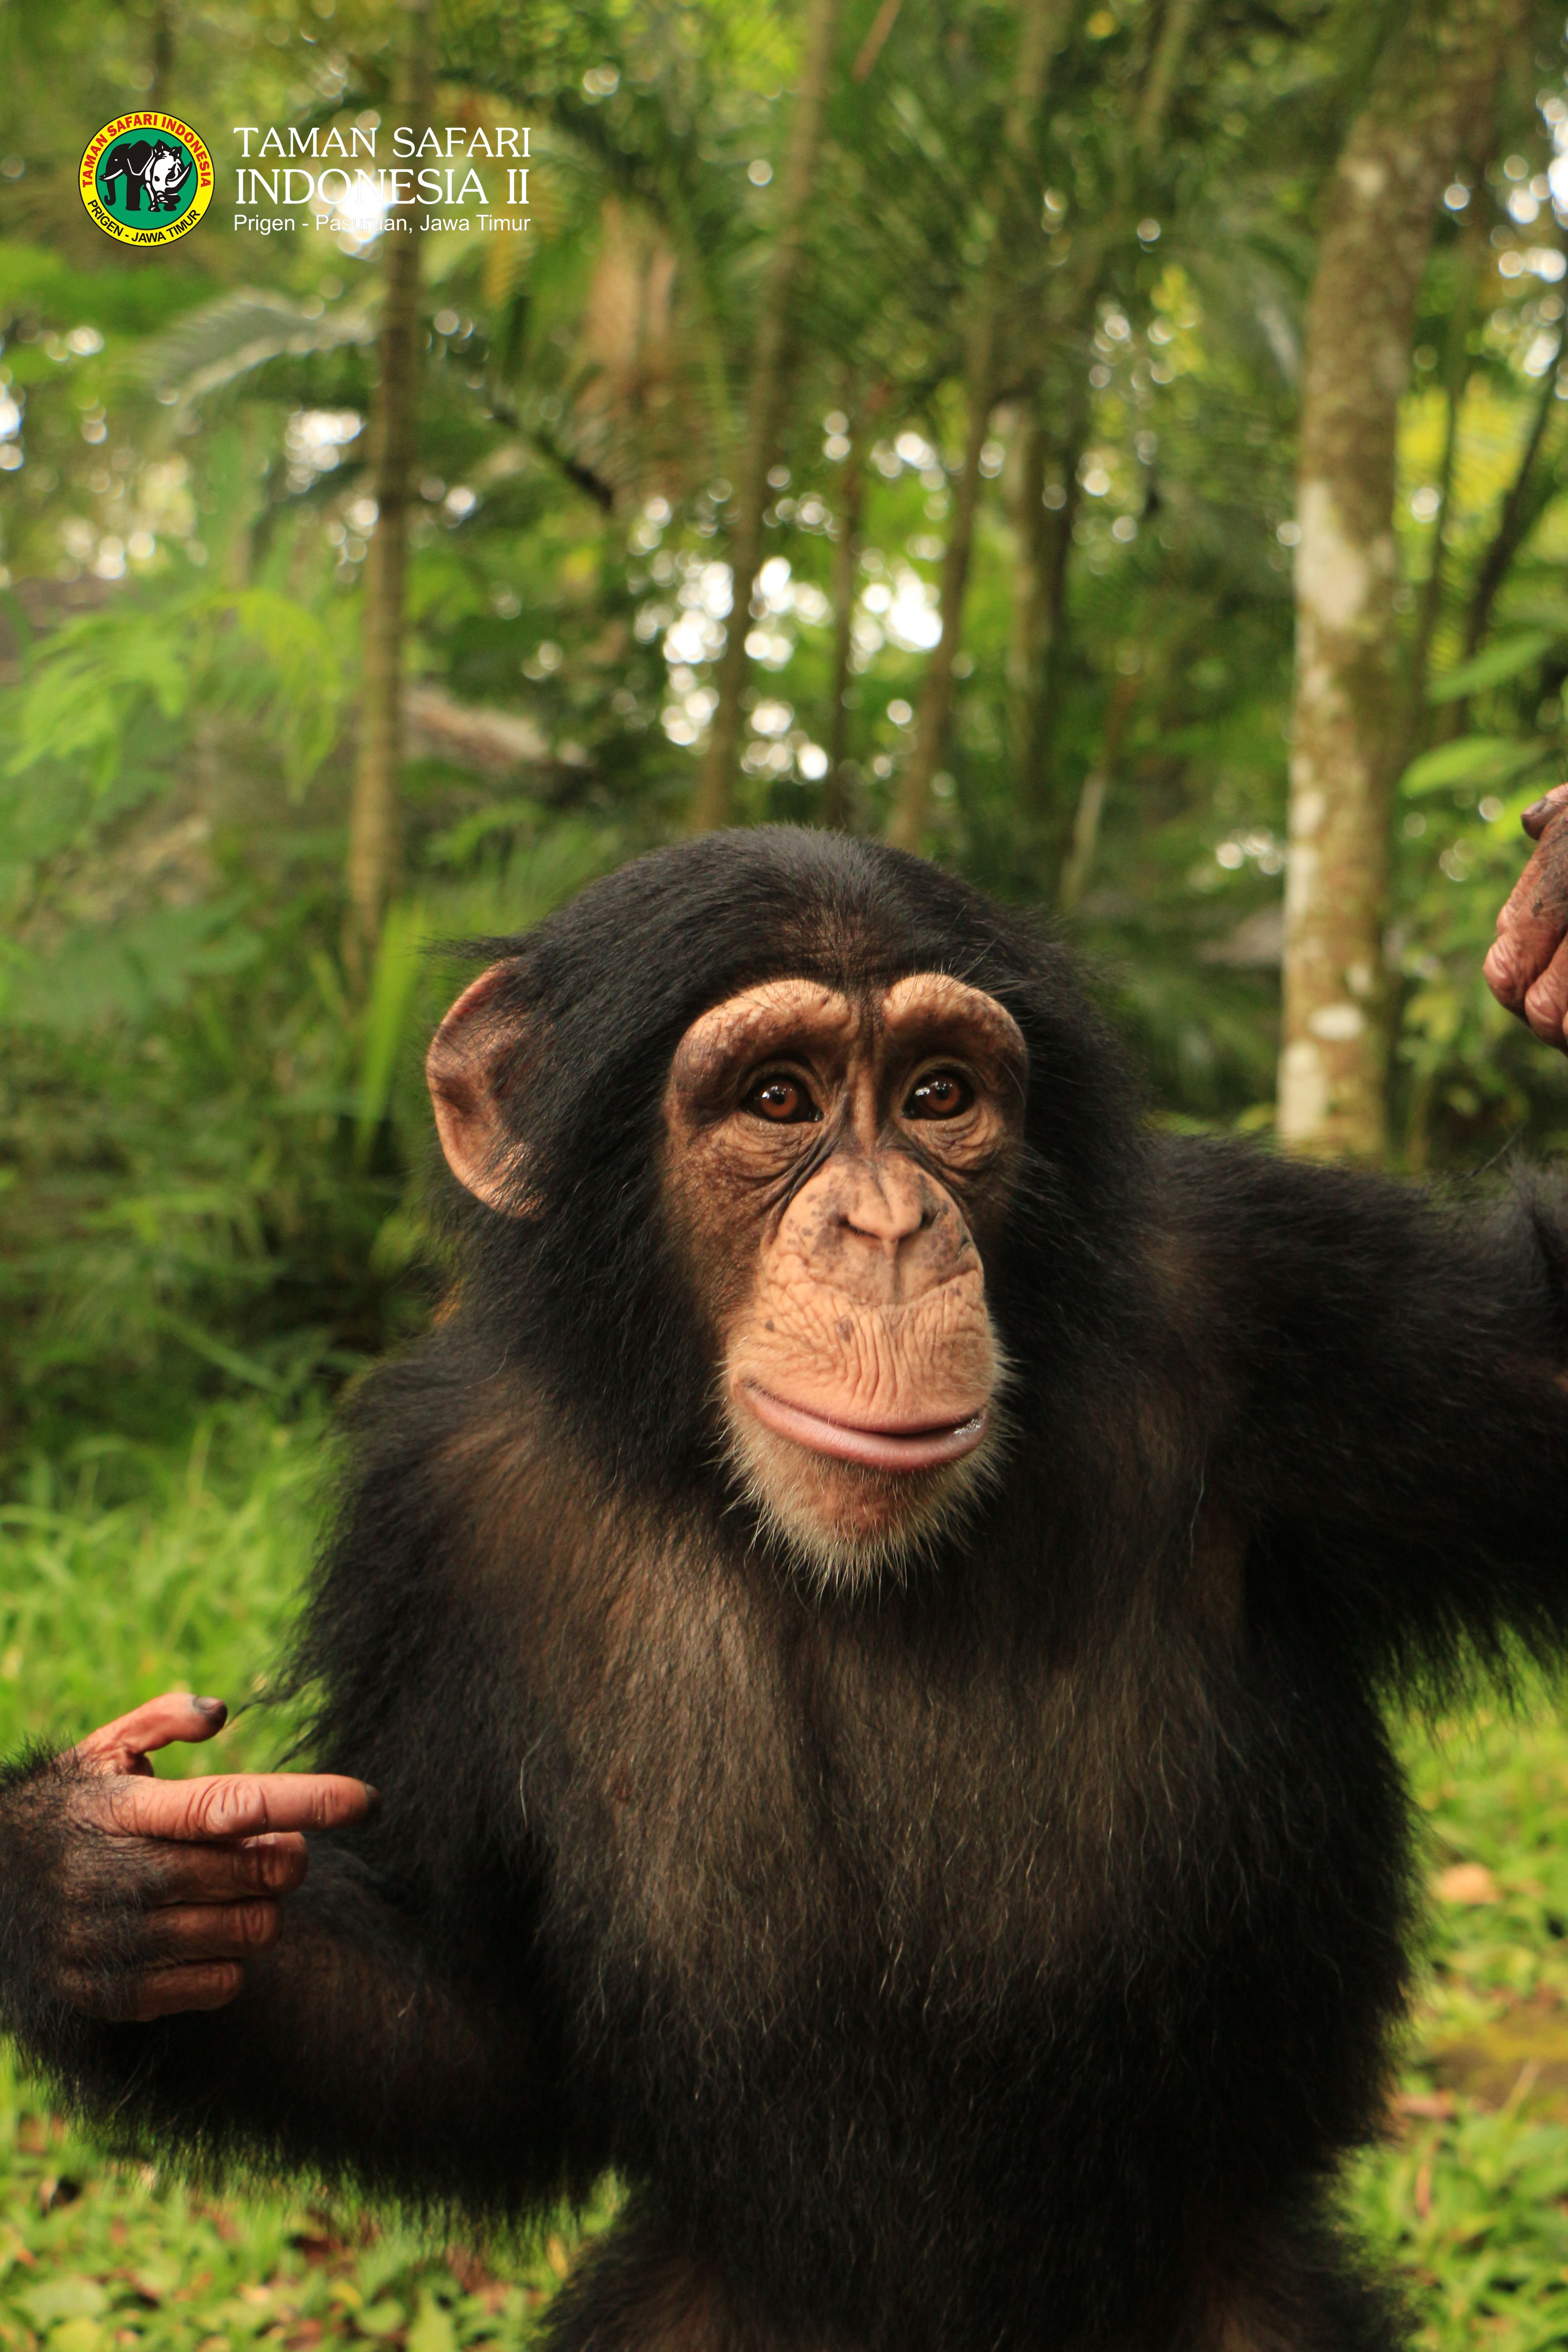 meet with this cute simpanseonly in taman safari prigen